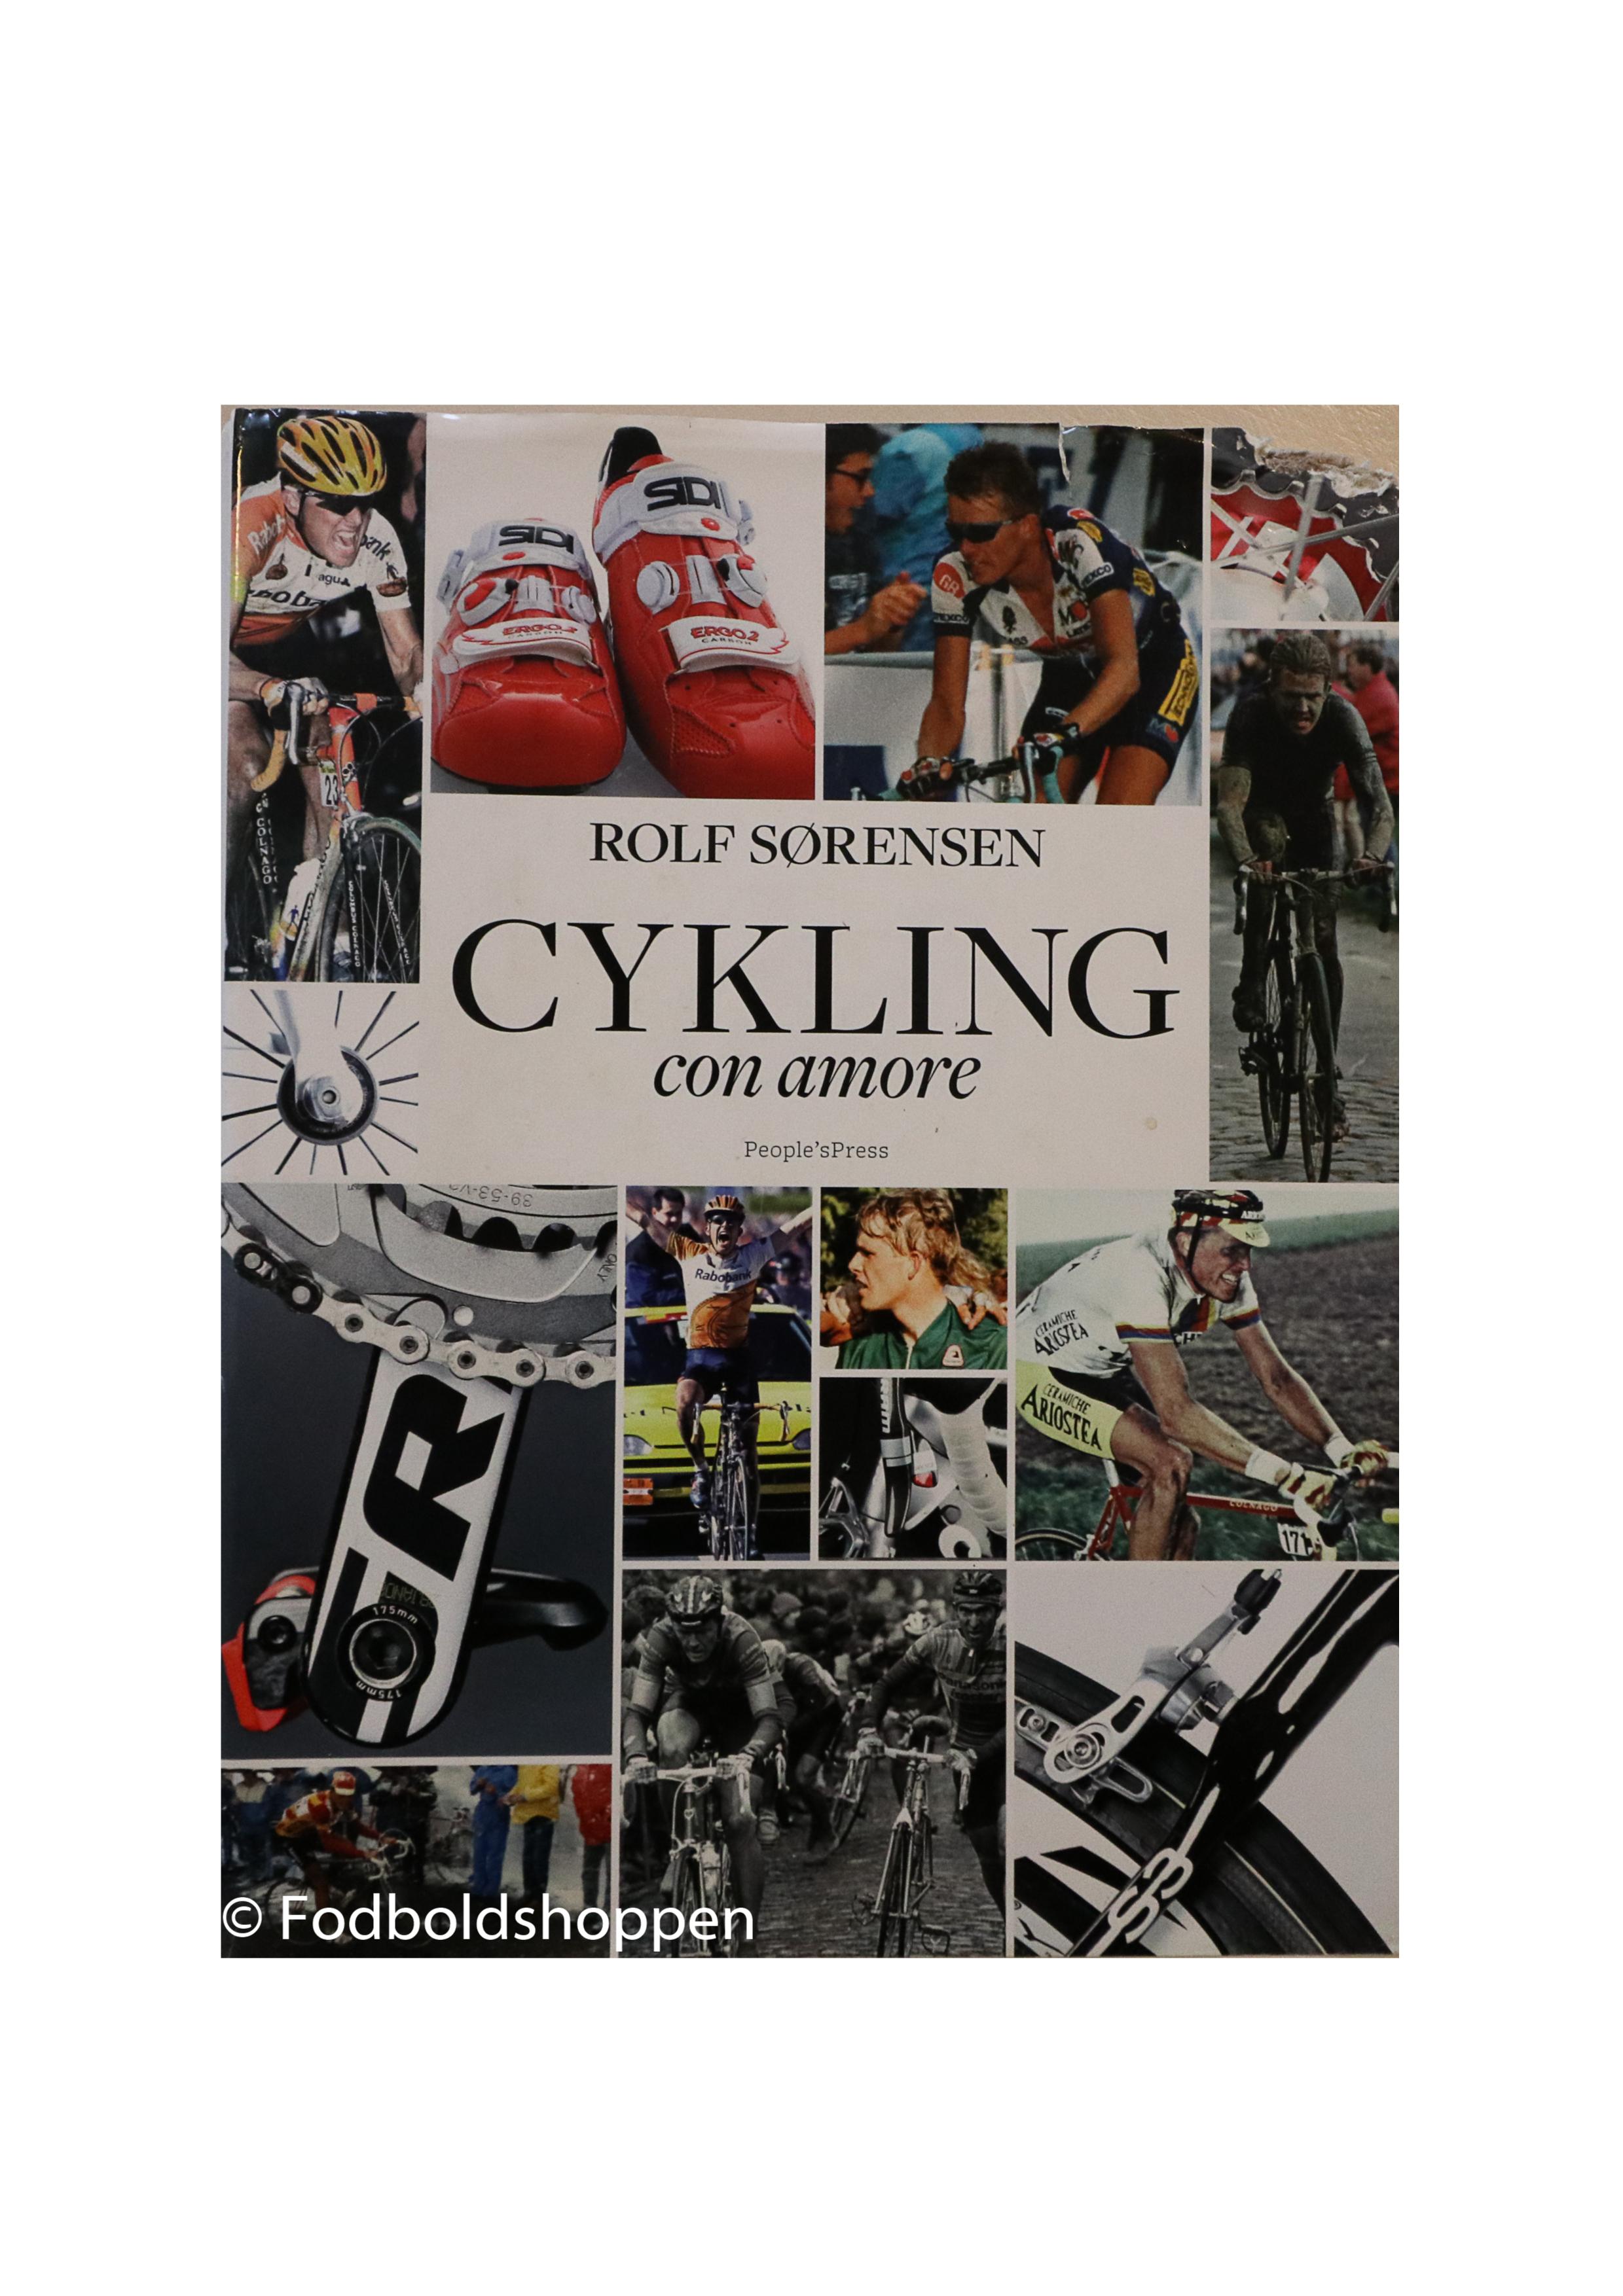 Bog om Cykelsport